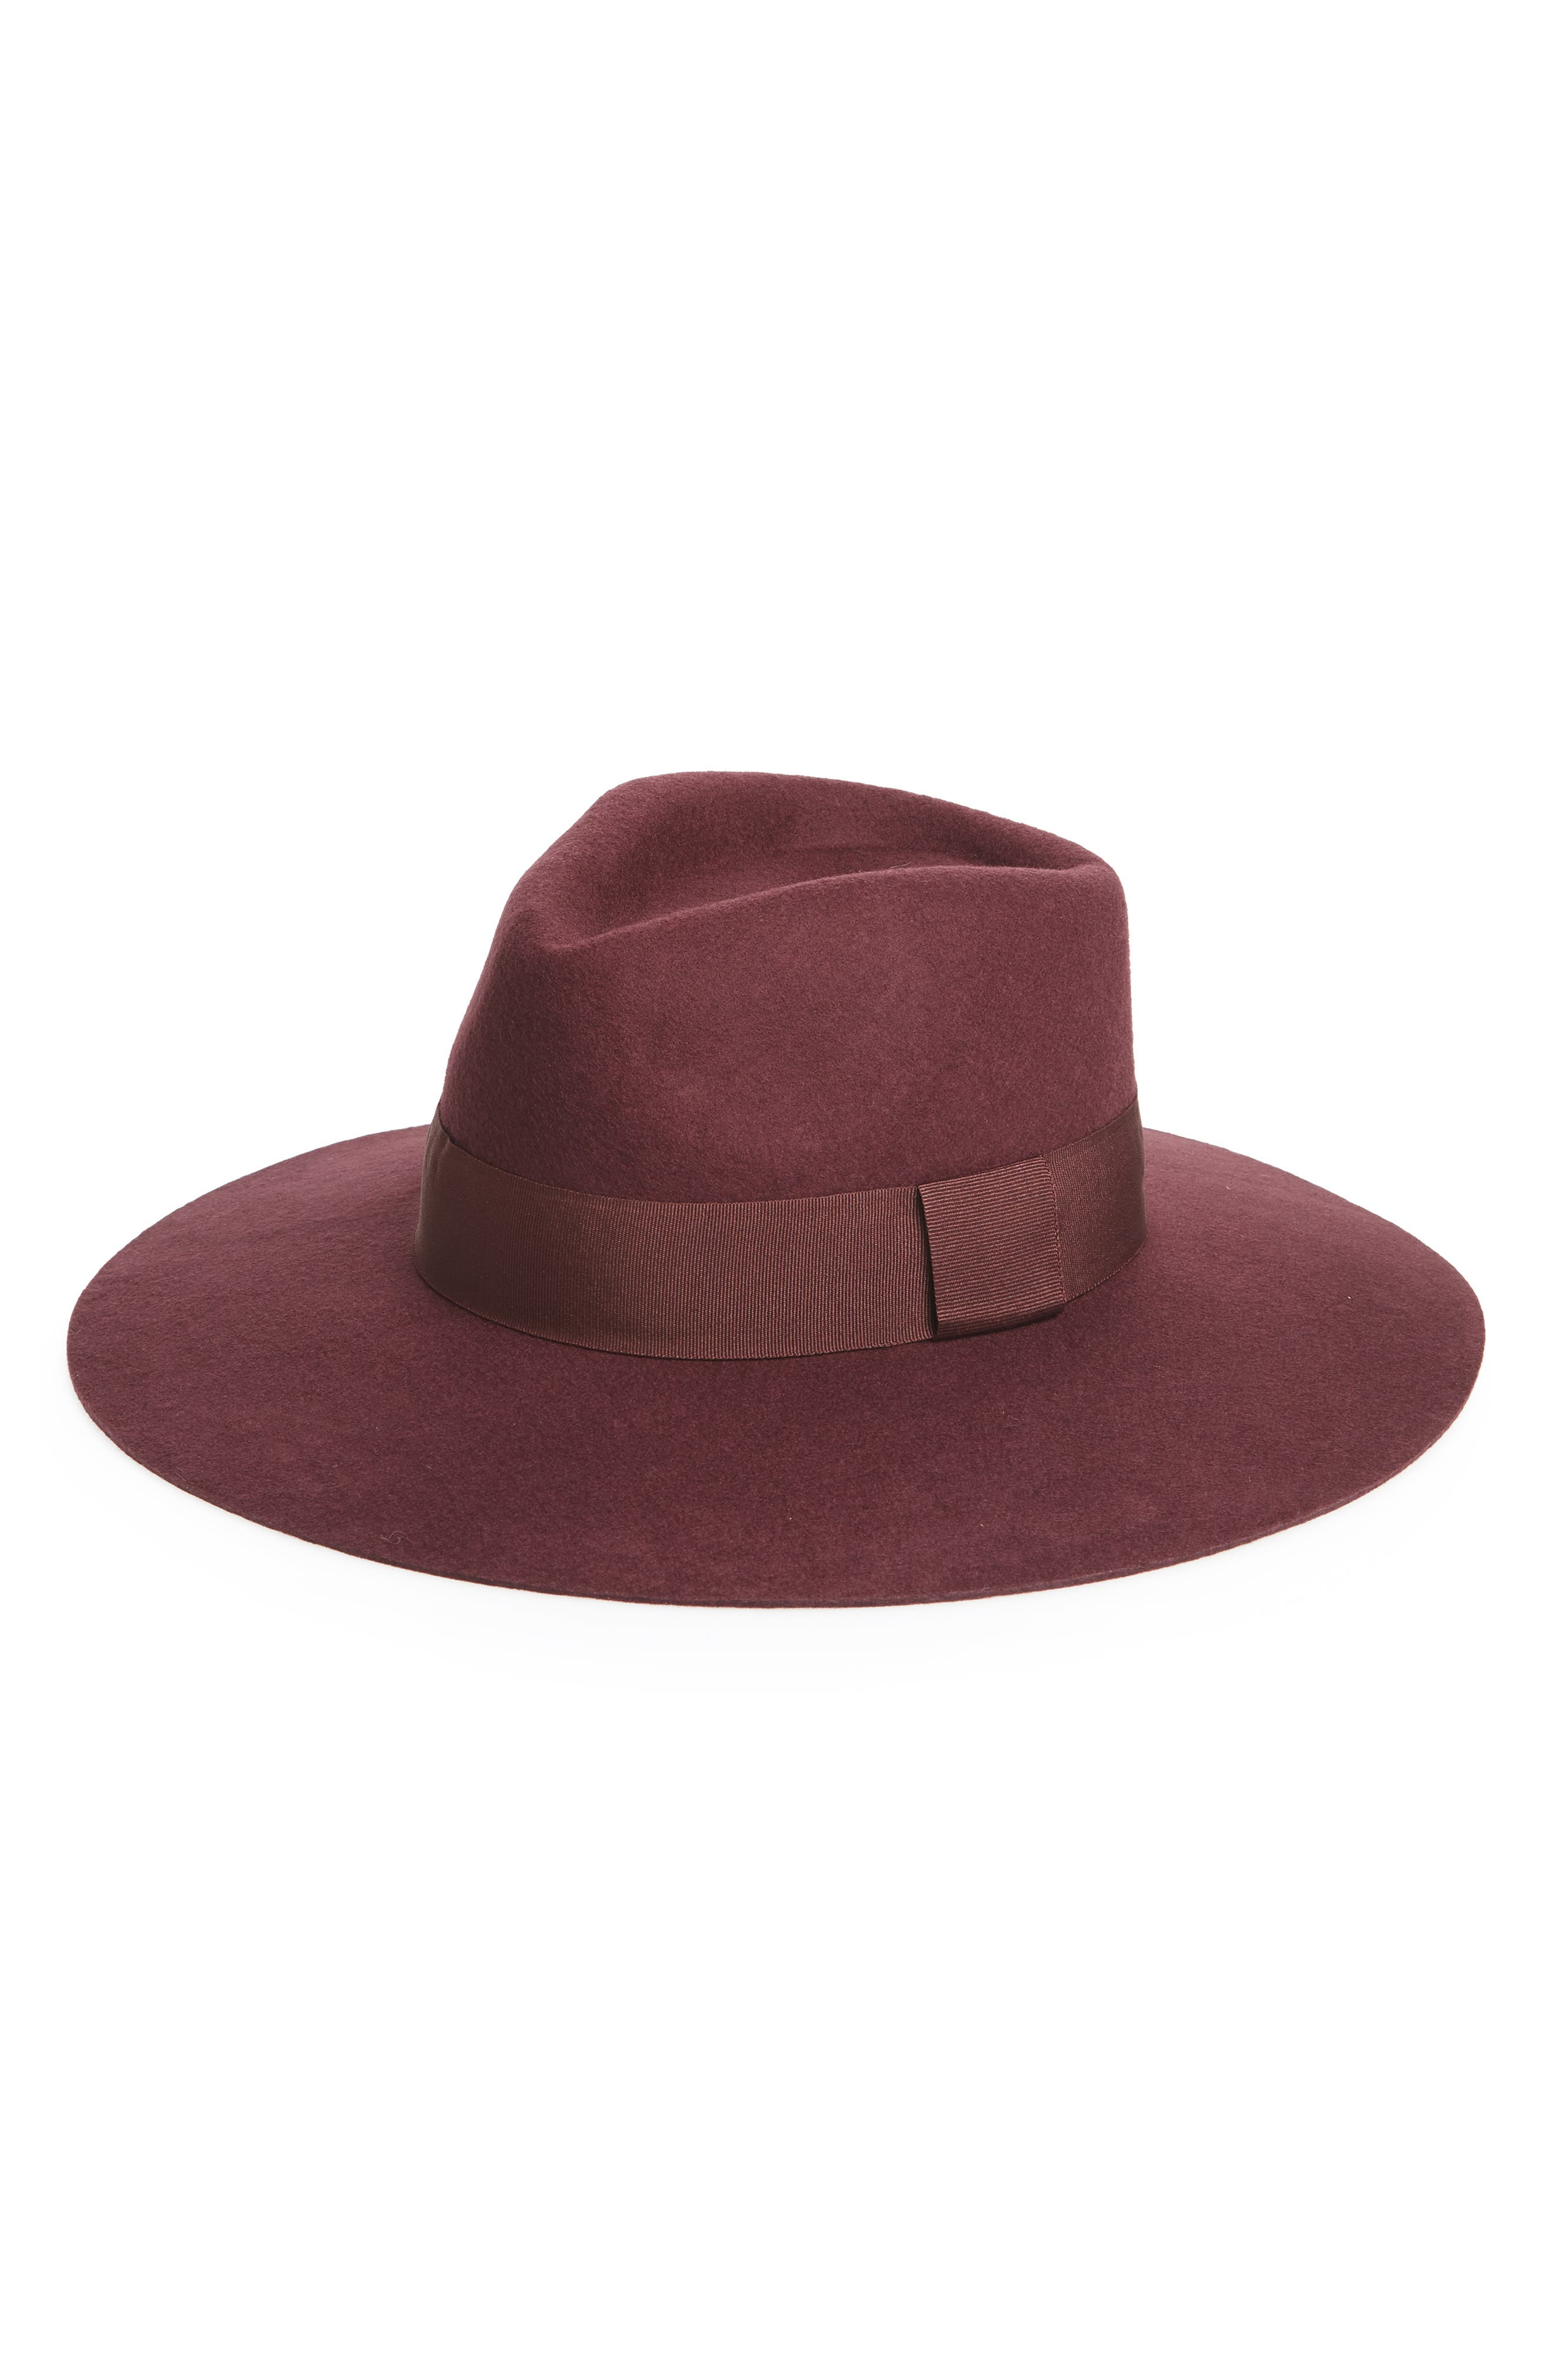 Wool Panama Hat,                             Main thumbnail 1, color,                             Burgundy